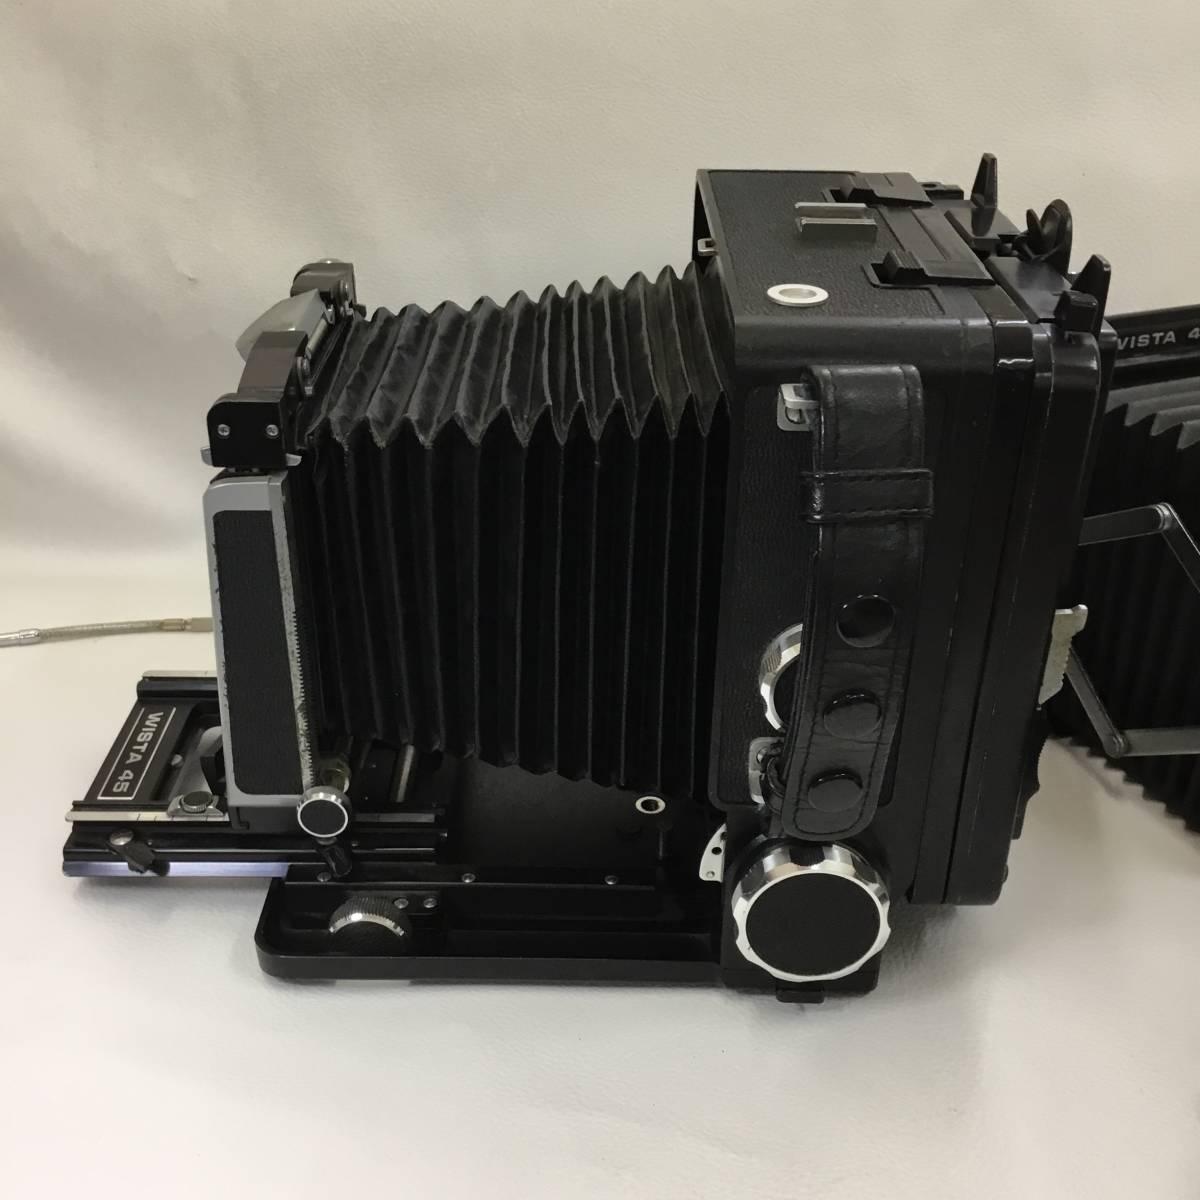 WISTA 45 ウィスタ45 レンズ 付属品セット 大判カメラ_画像6